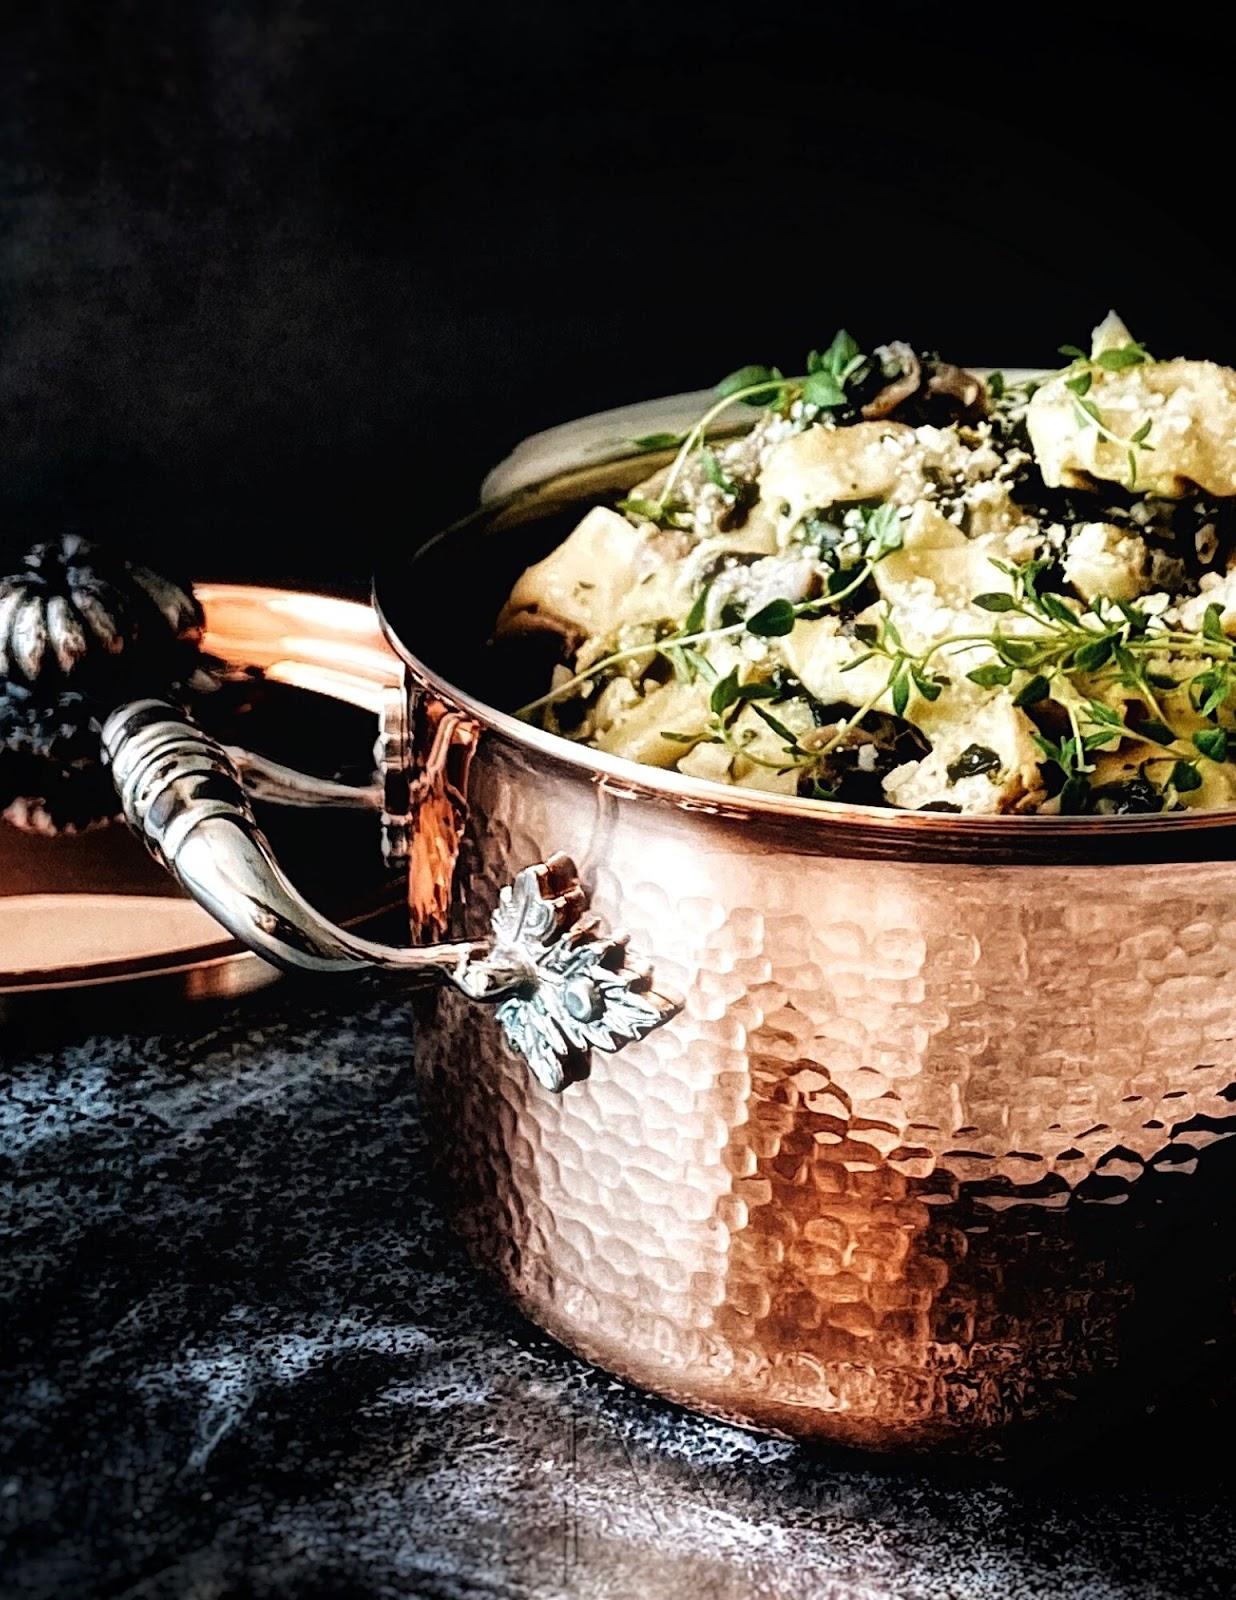 Ruffoni Copper pots pans